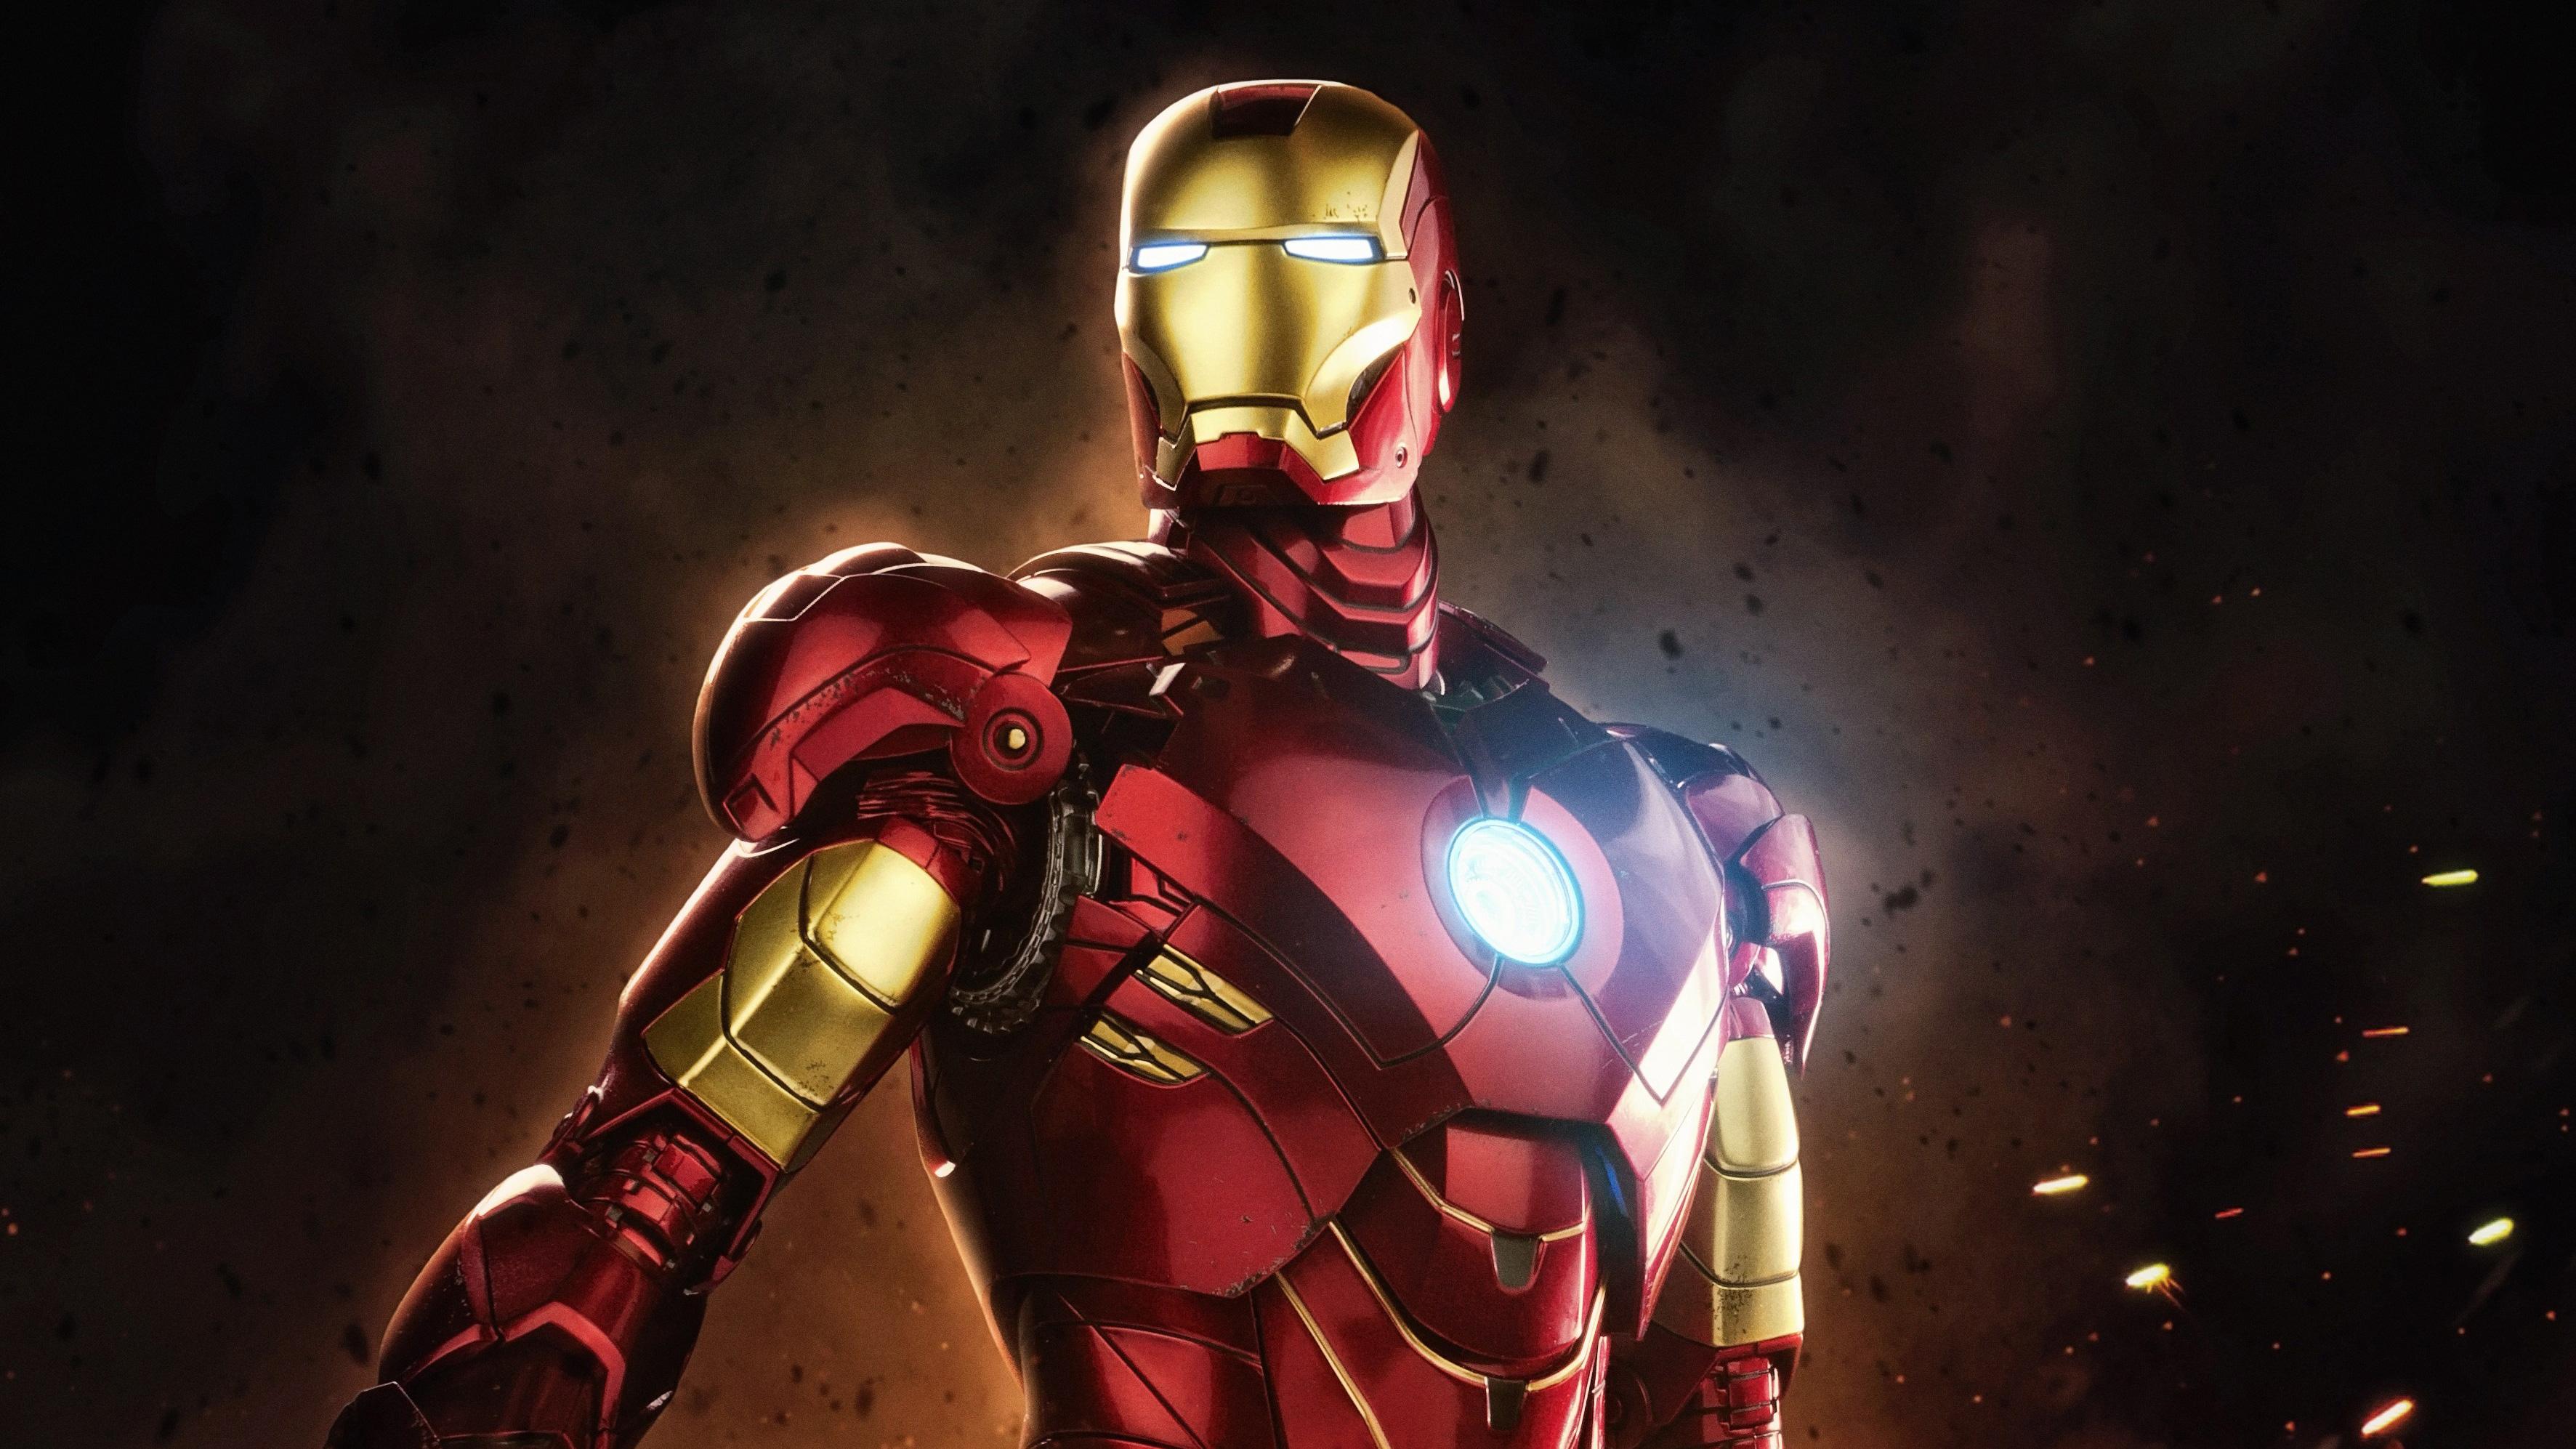 Iron Man HD Wallpaper | Background Image | 3545x1994 | ID:949985 - Wallpaper Abyss